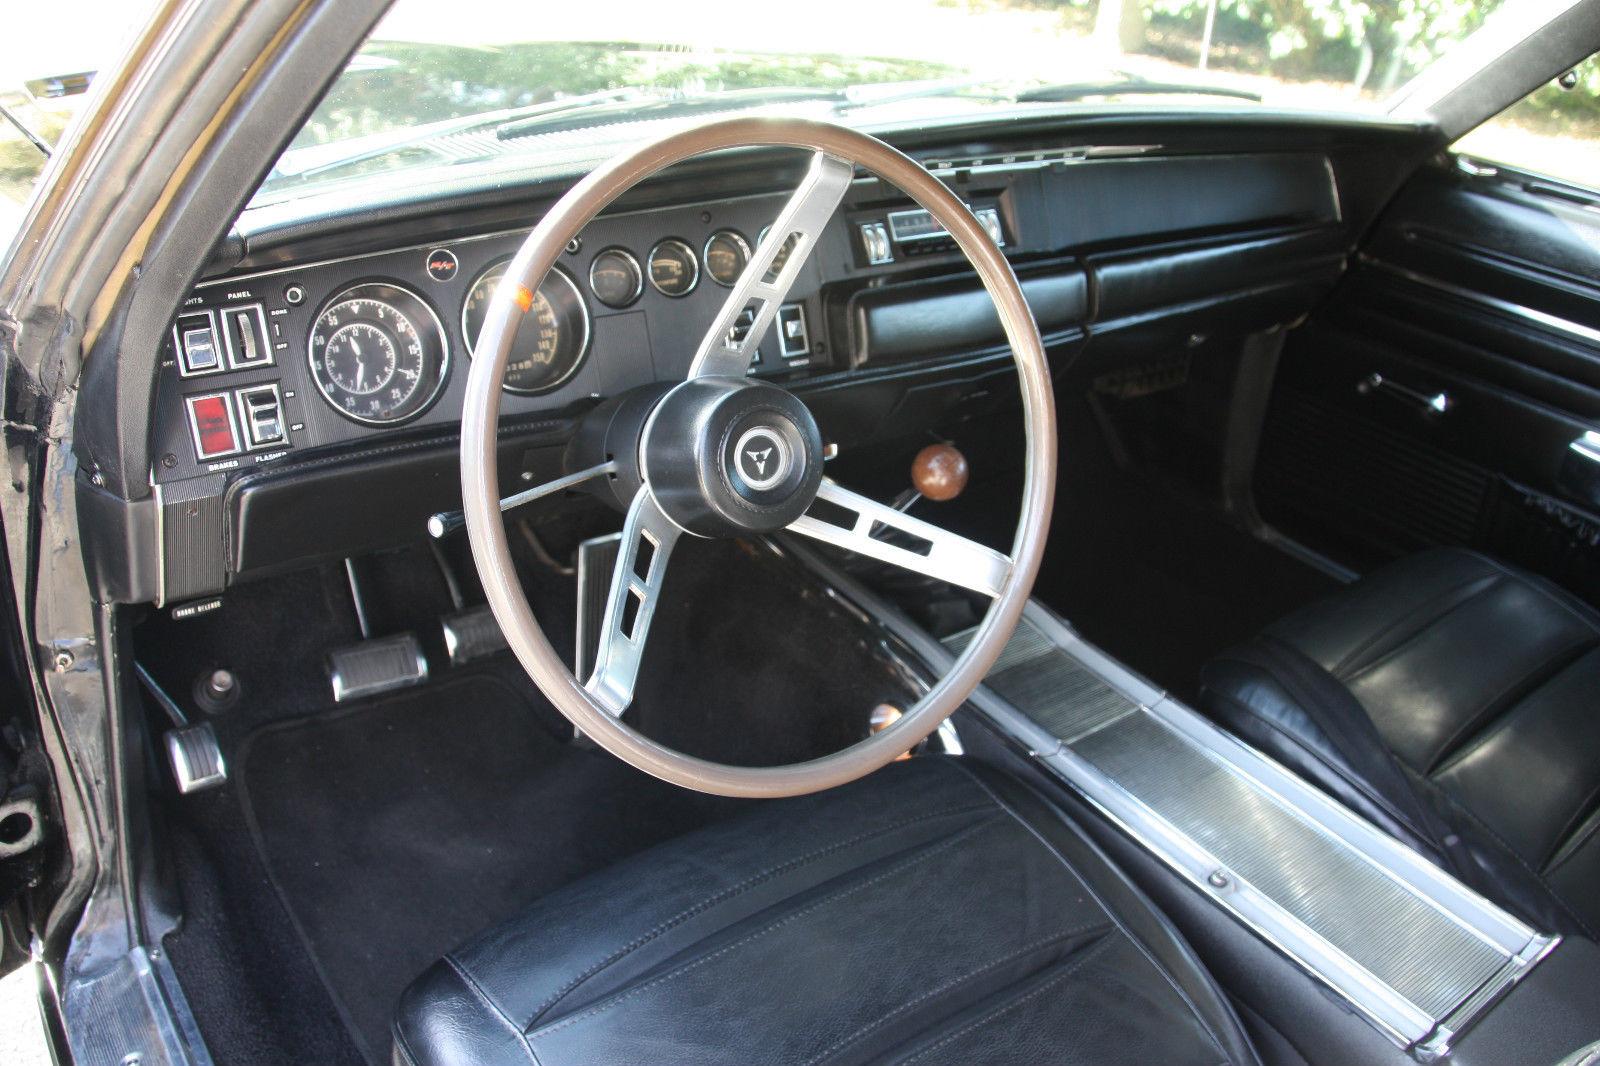 1968 Dodge Charger Wallpaper Cars 1968 Dodge Charger R T Triple Black 440 Engine Hurst